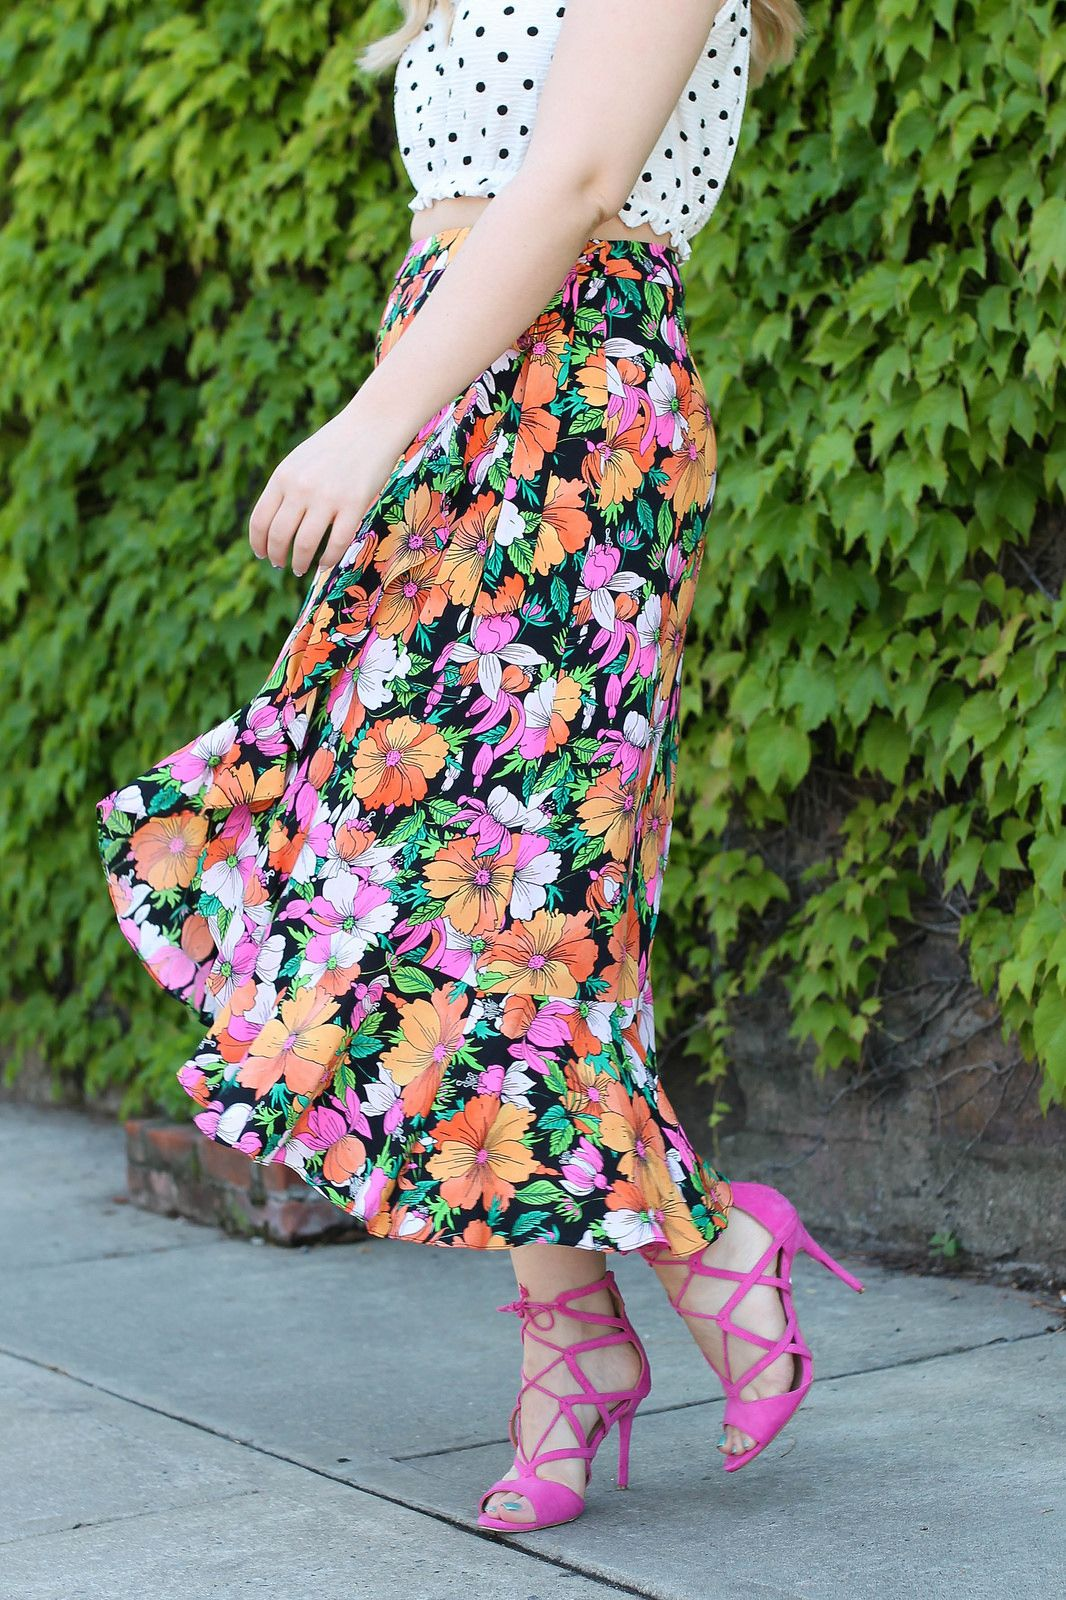 d722a9eaf Topshop Heavy Petal Print Midi Skirt Nordstrom Westchester Pink Lace Up  Sandals